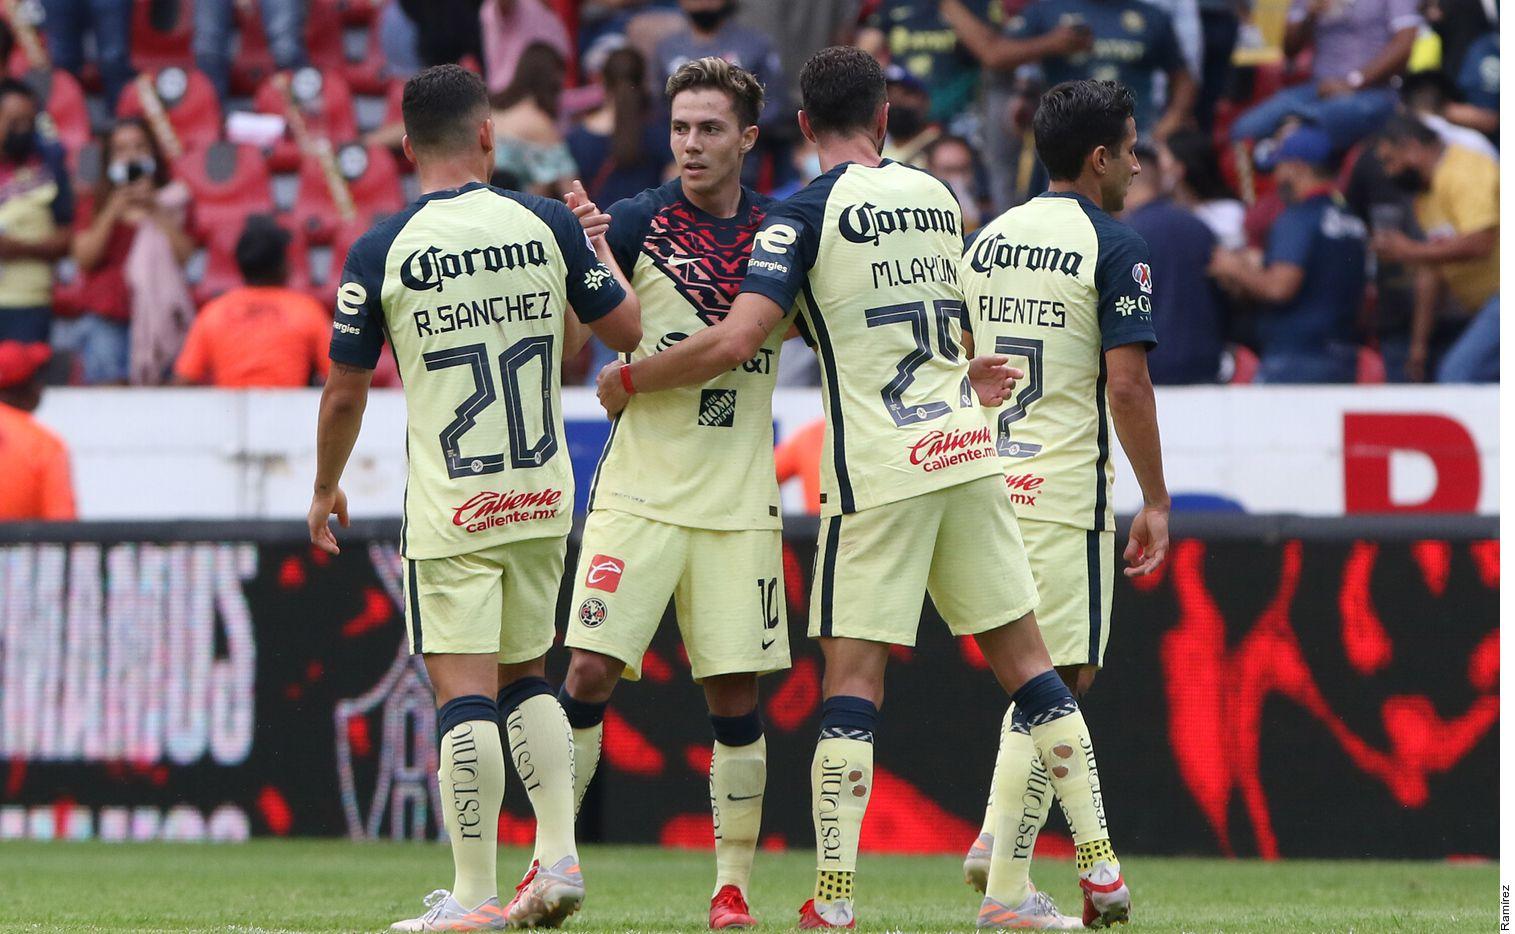 El América remontó para vencer el miércoles 2-1 a Ciudad Juárez.